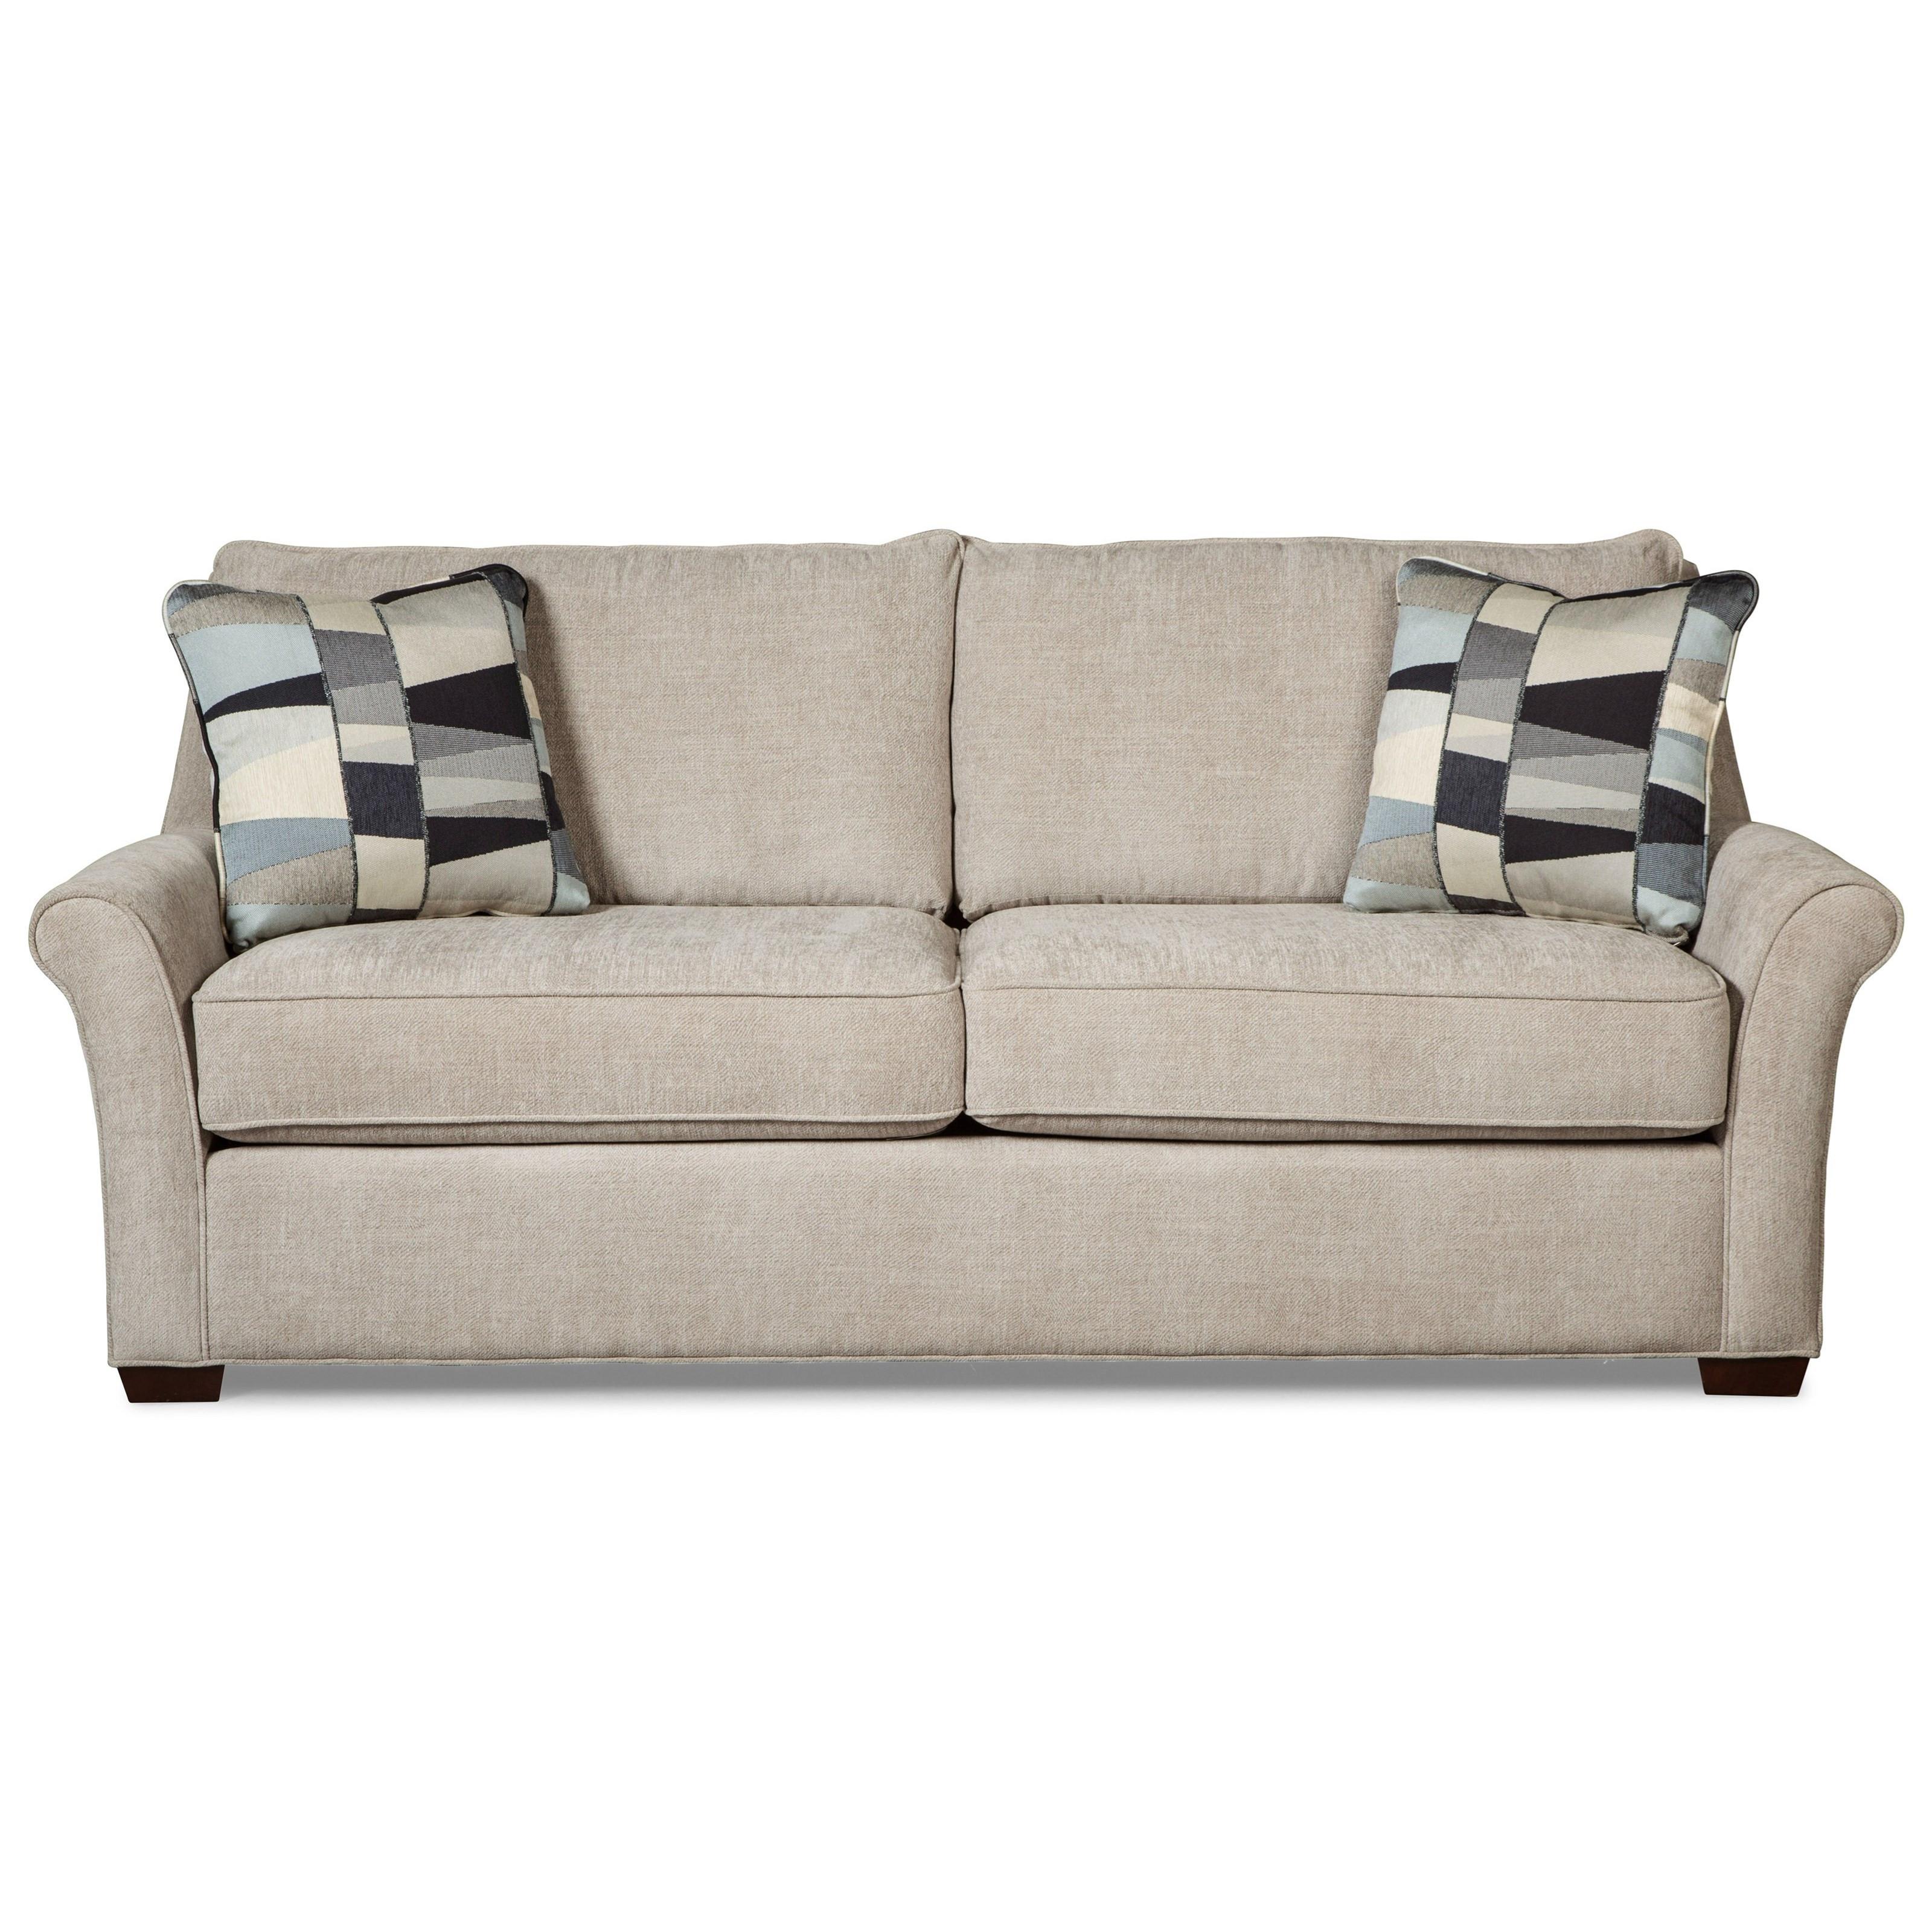 Best ideas about Queen Sleeper Sofa Mattress . Save or Pin Transitional Queen Sleeper Sofa with Memory Foam Mattress Now.